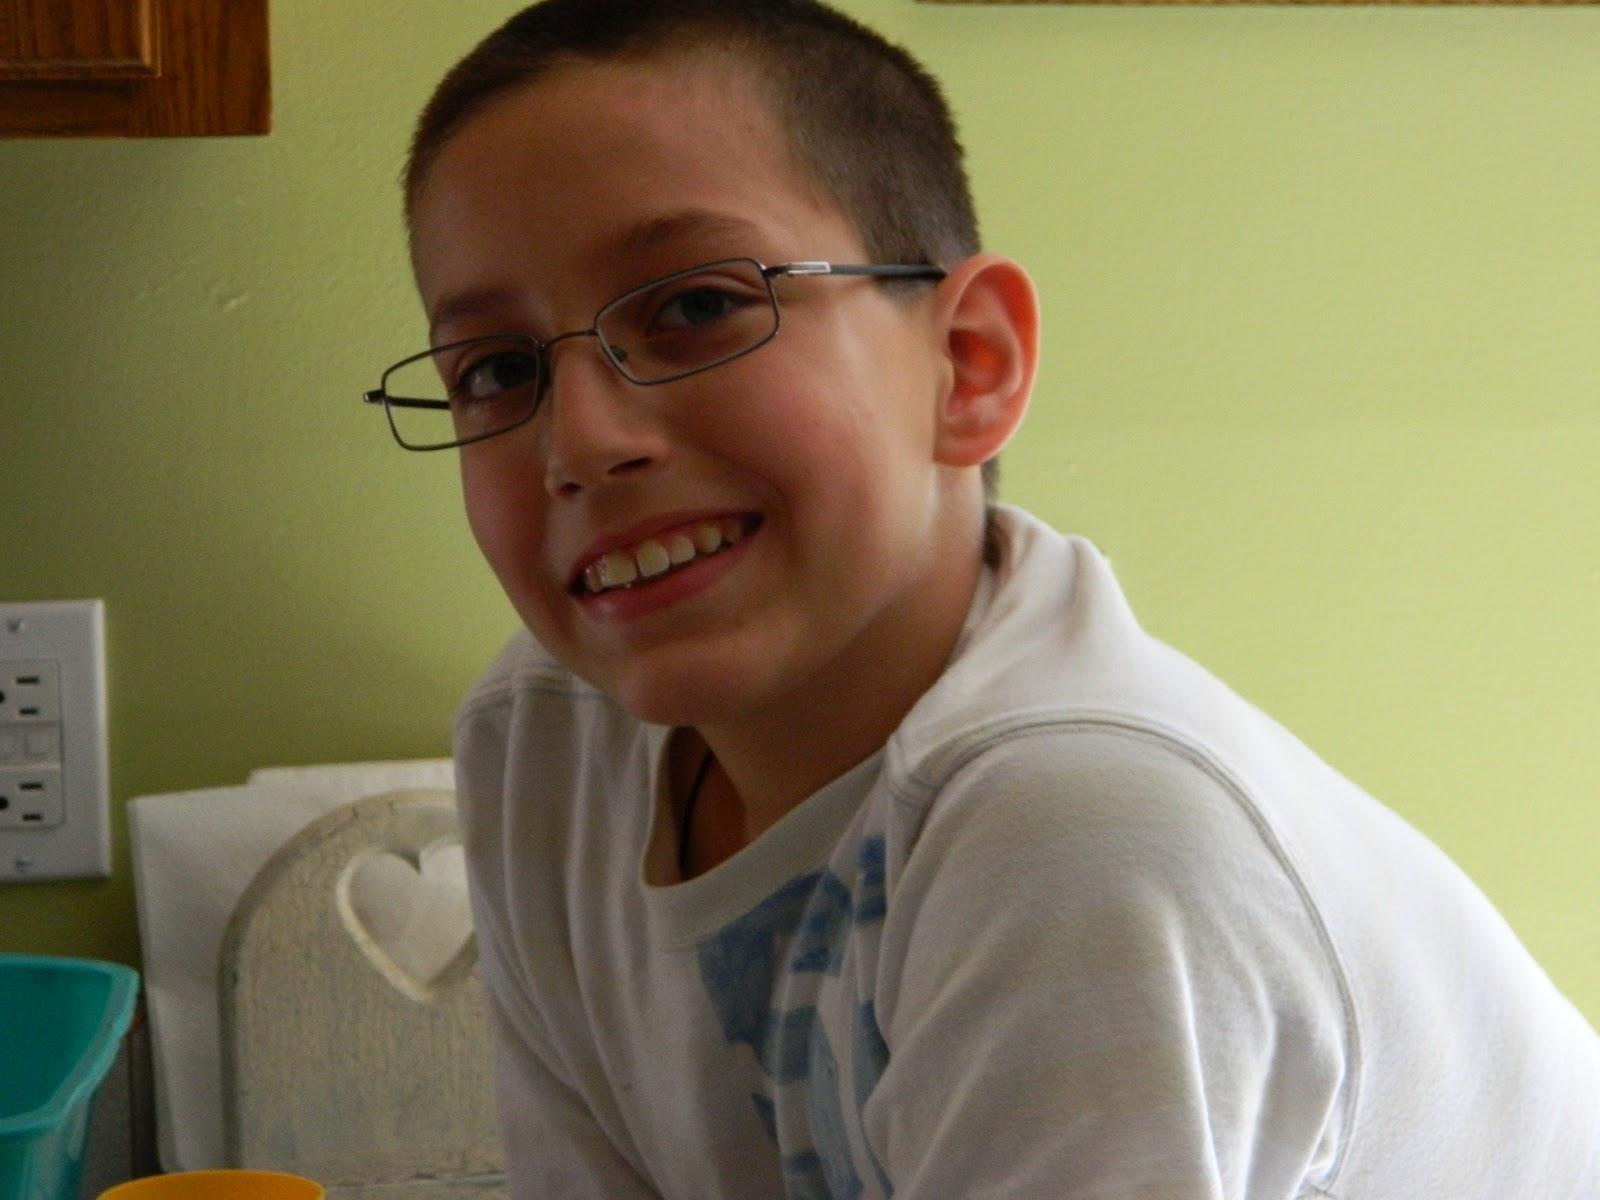 Cute 12 Year Old Boy Holidays Oo